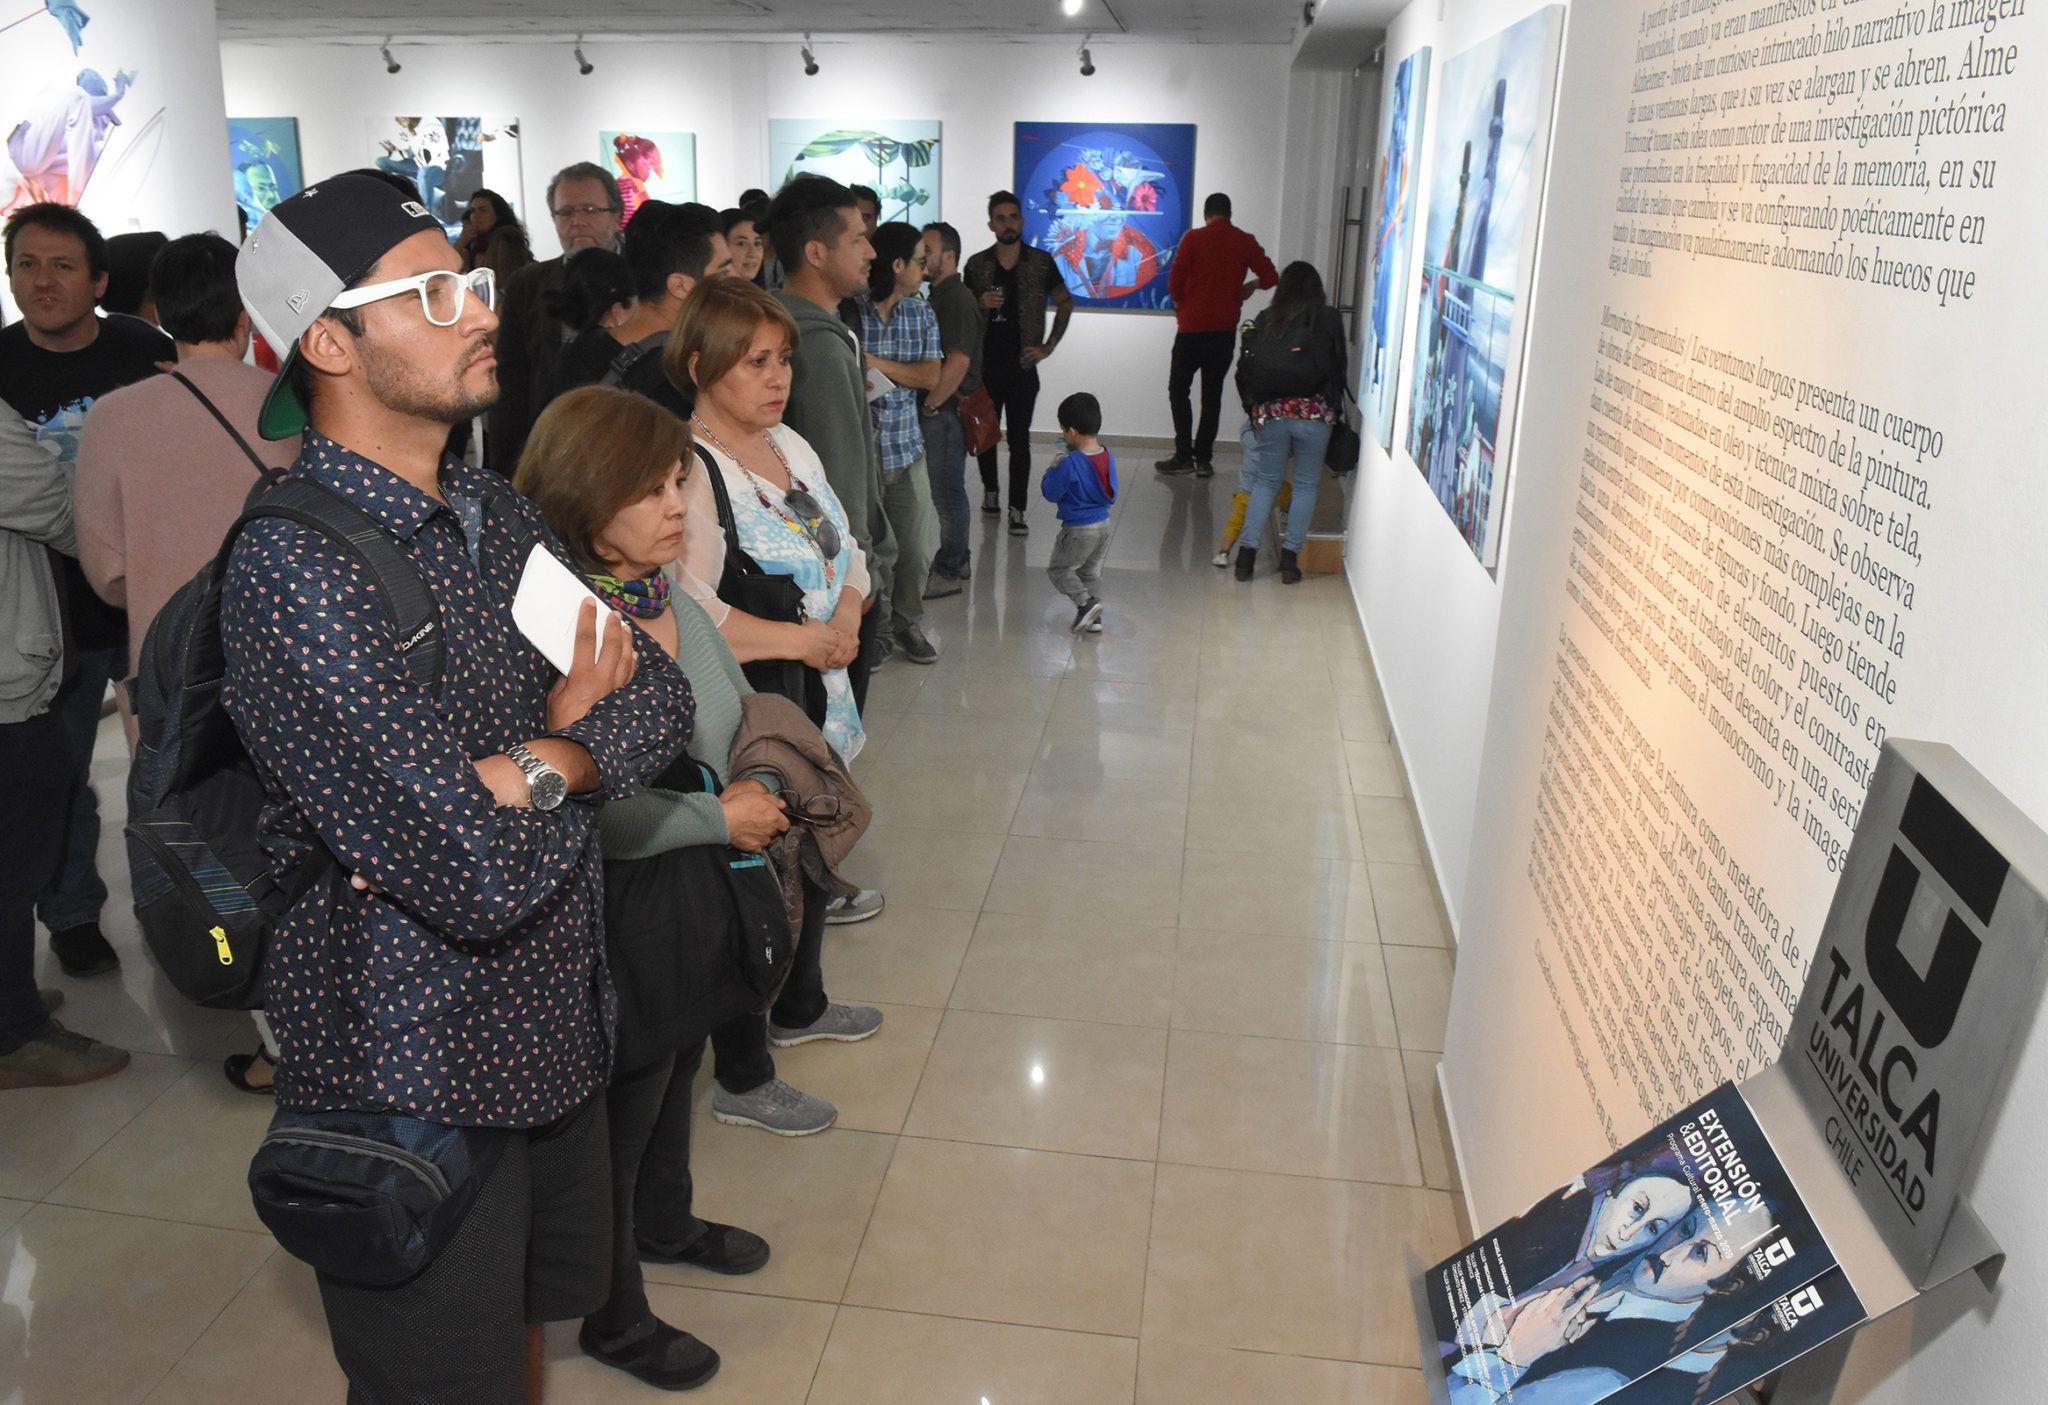 Exposición Memorias Fragmentadas / Las Ventanas Largas